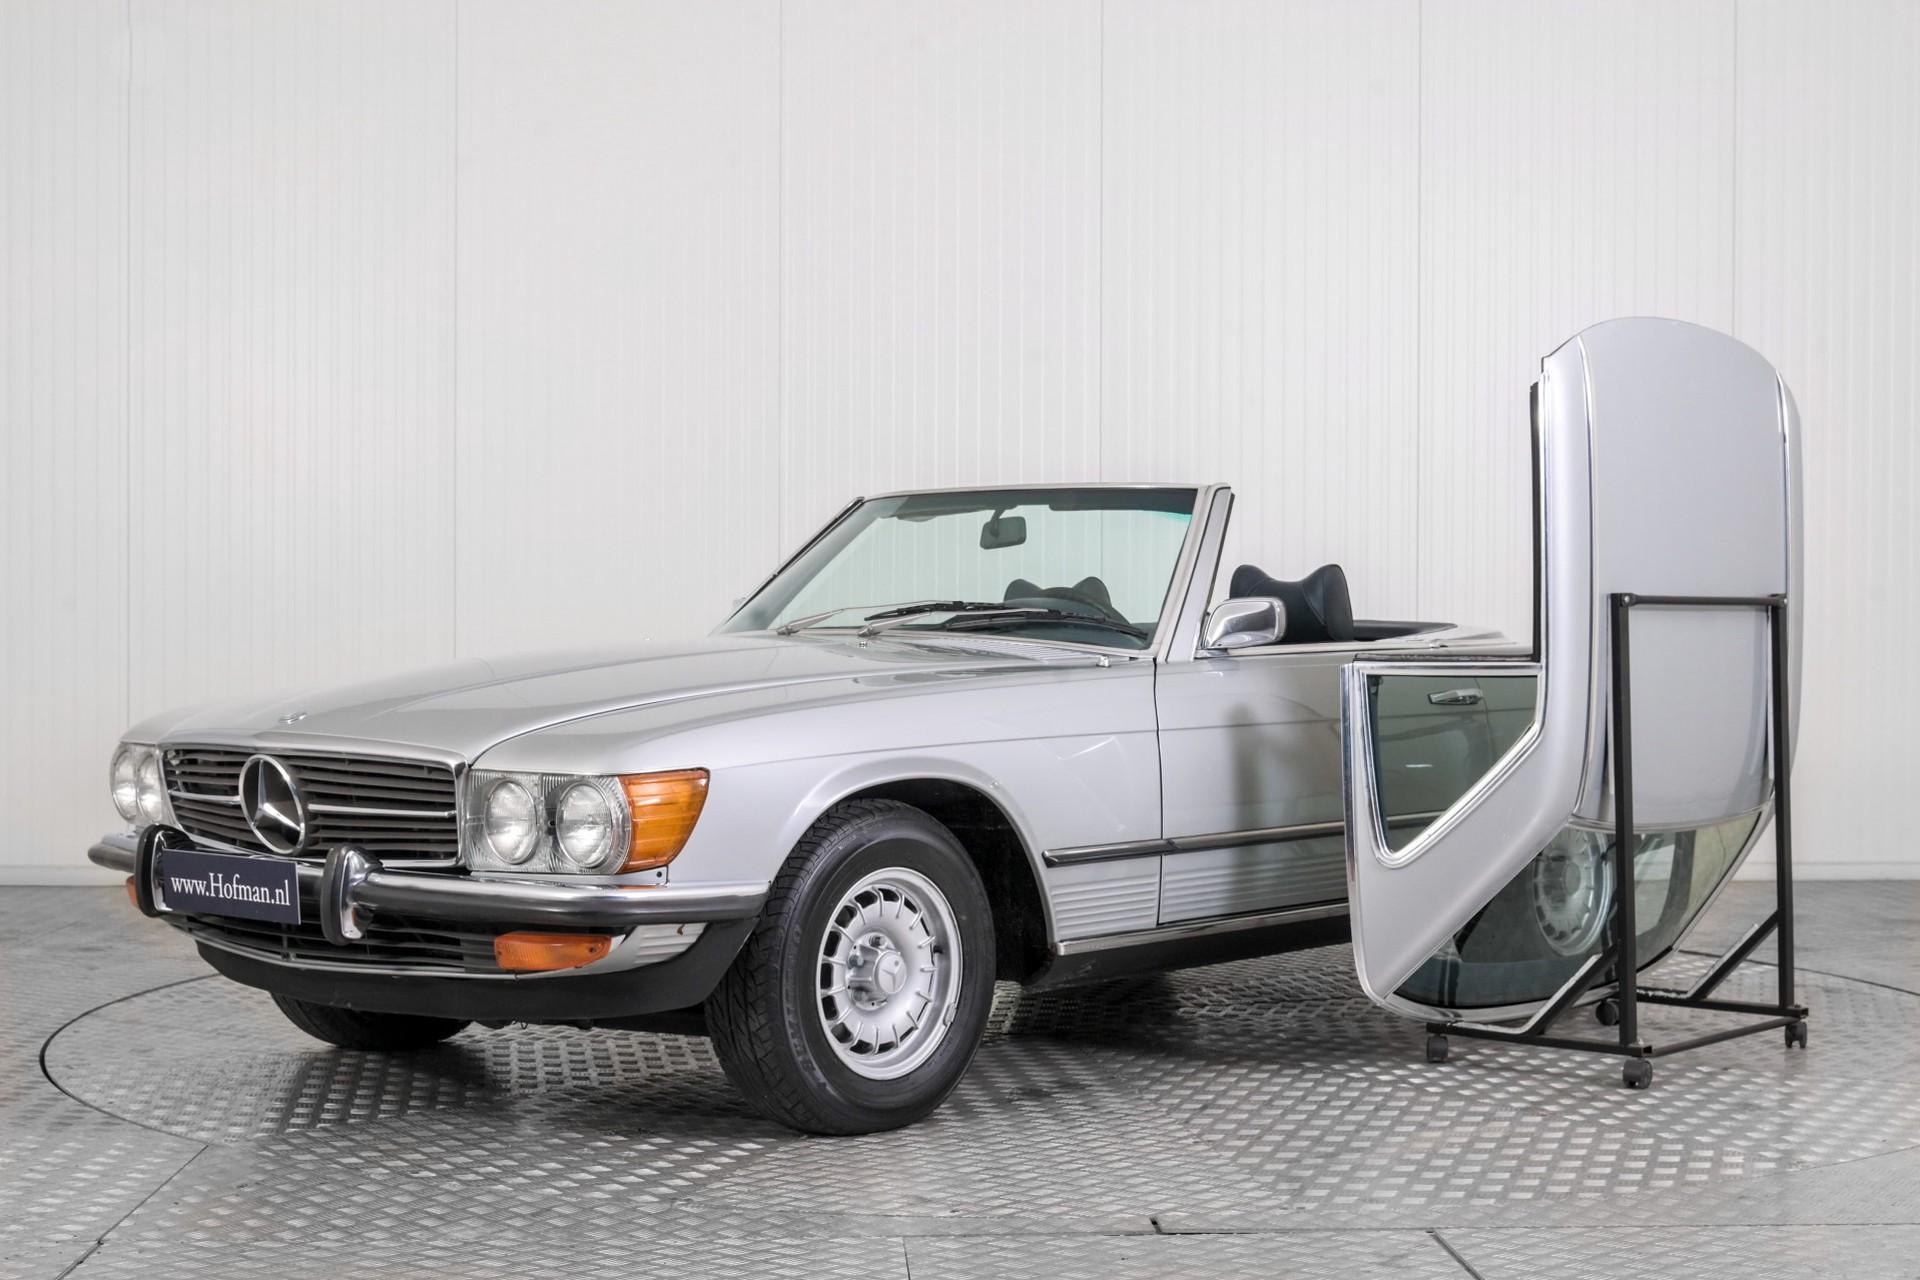 Mercedes-Benz SL-Klasse 450 SL roadster Foto 5